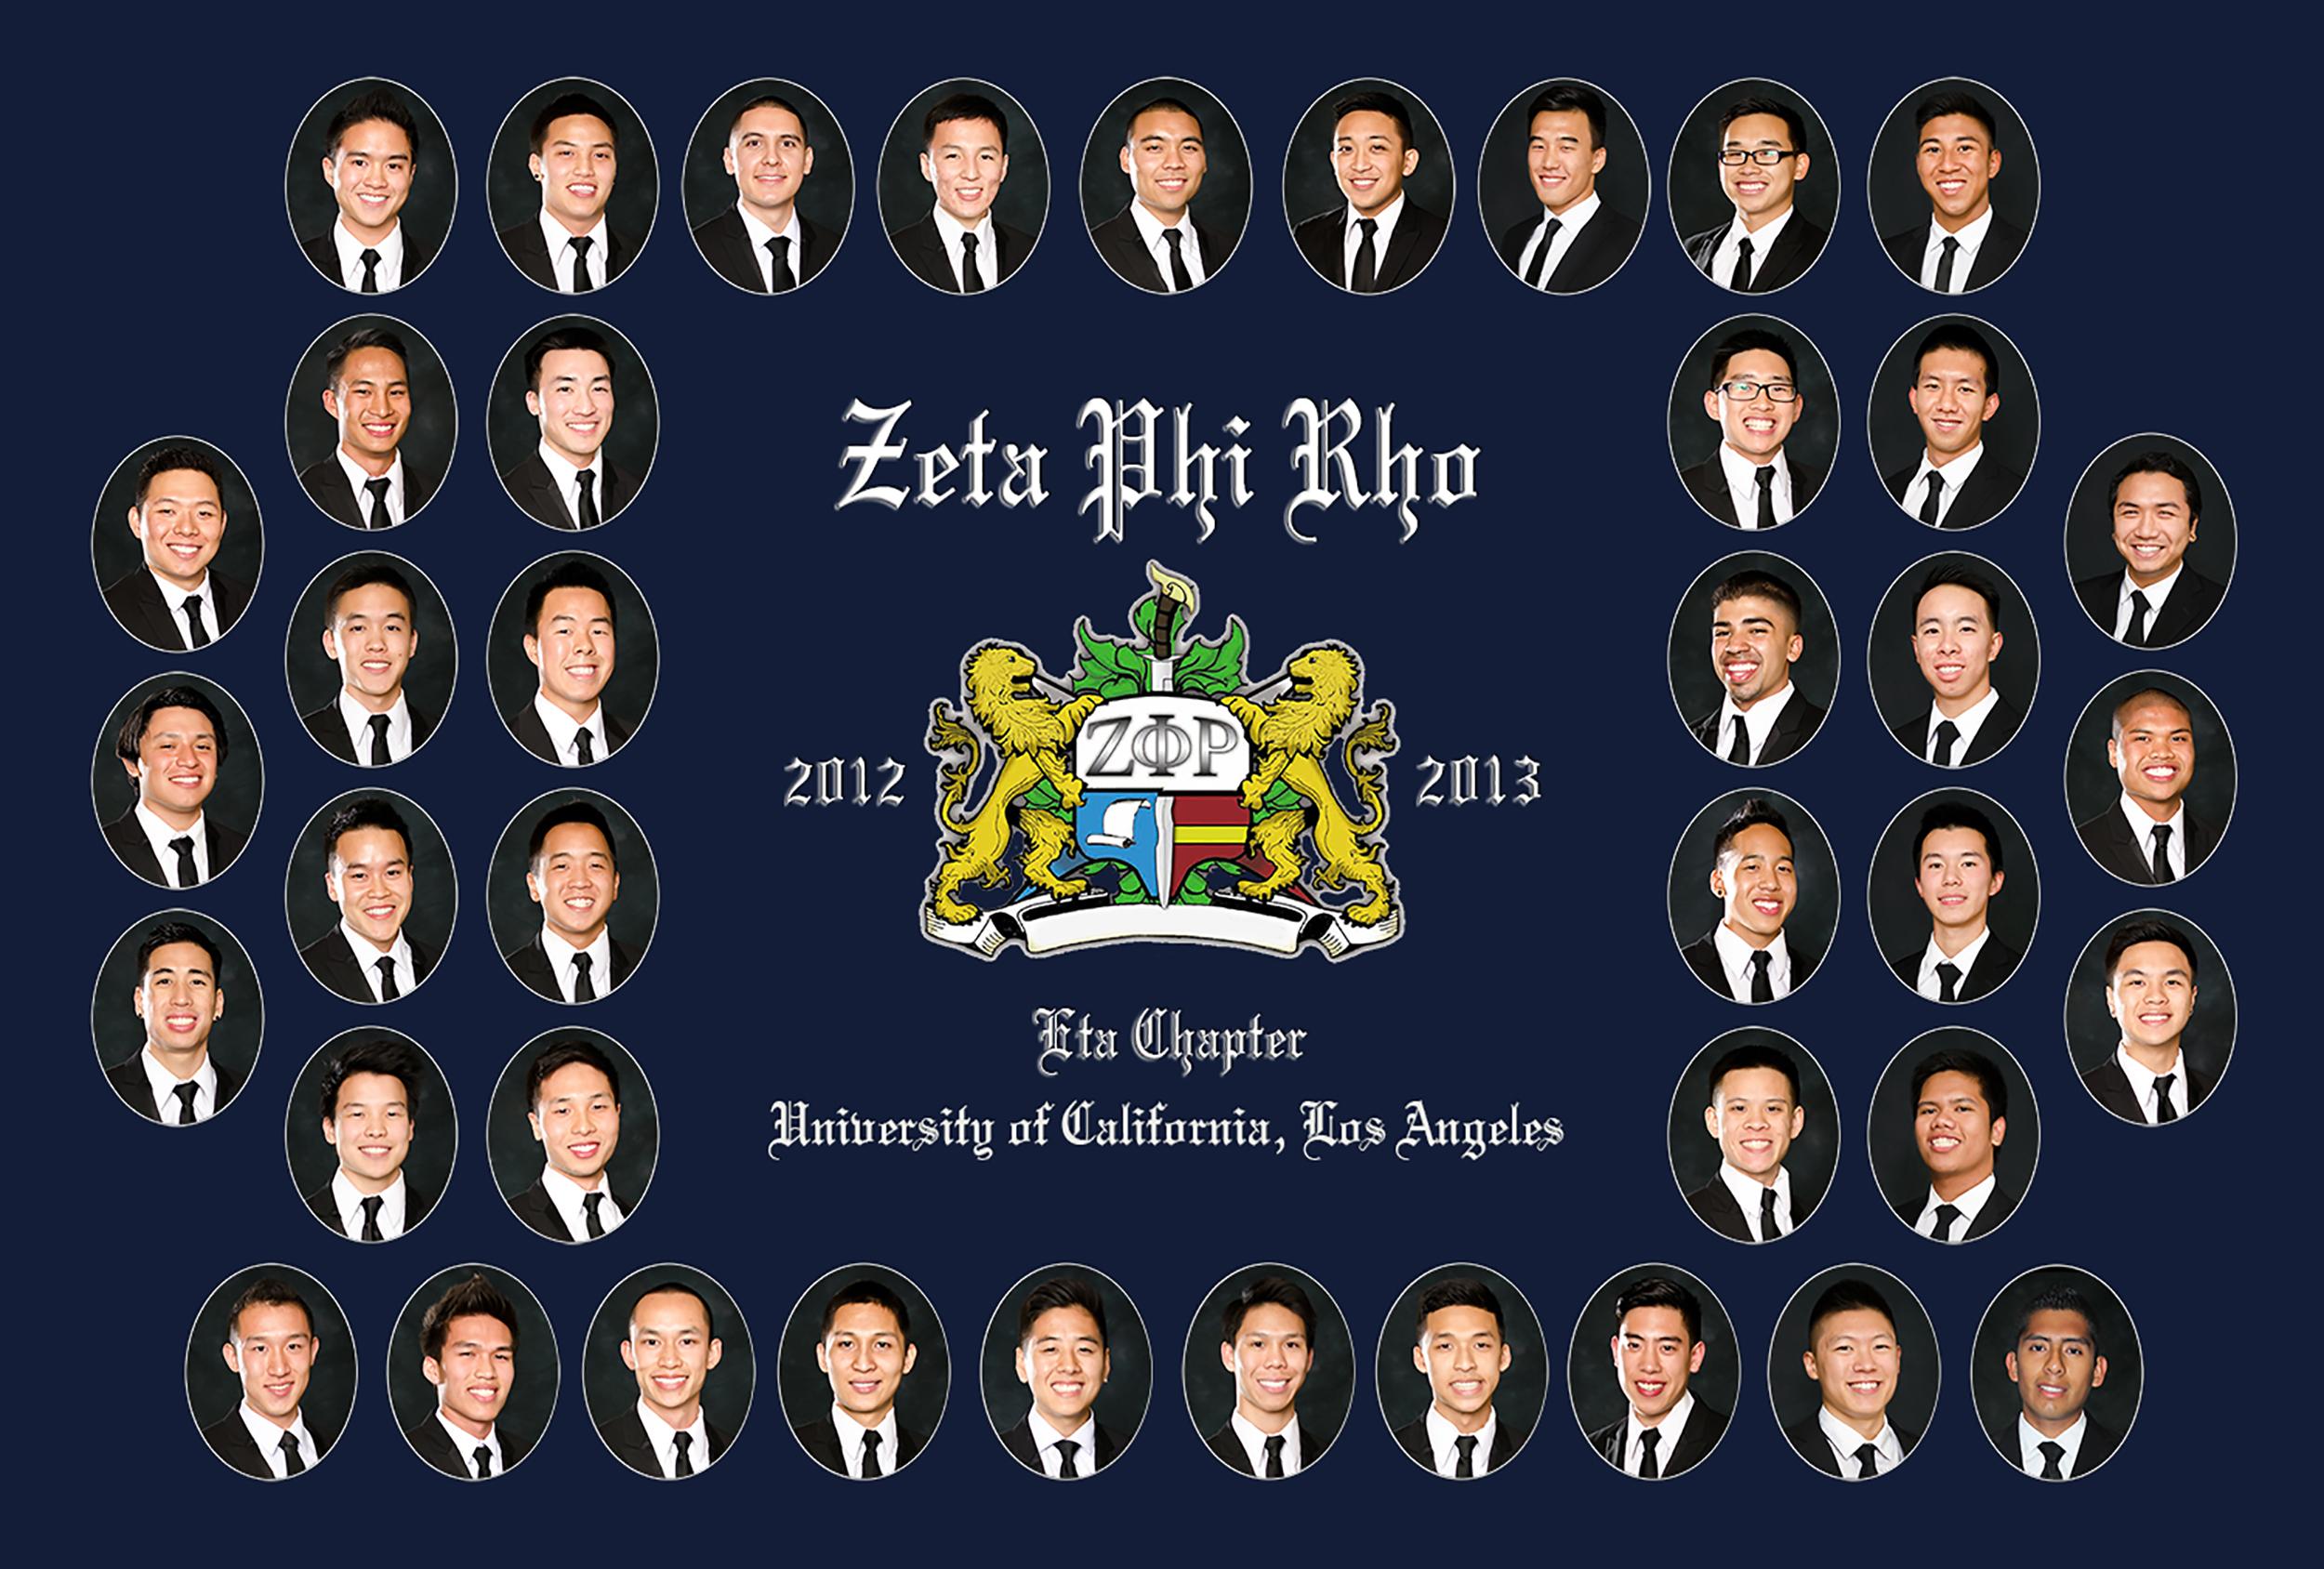 2012-2013-Bryan-Miraflor-Photography-Zeta-Phi-Rho-Eta-Chapter-UCLA-Composite.jpg